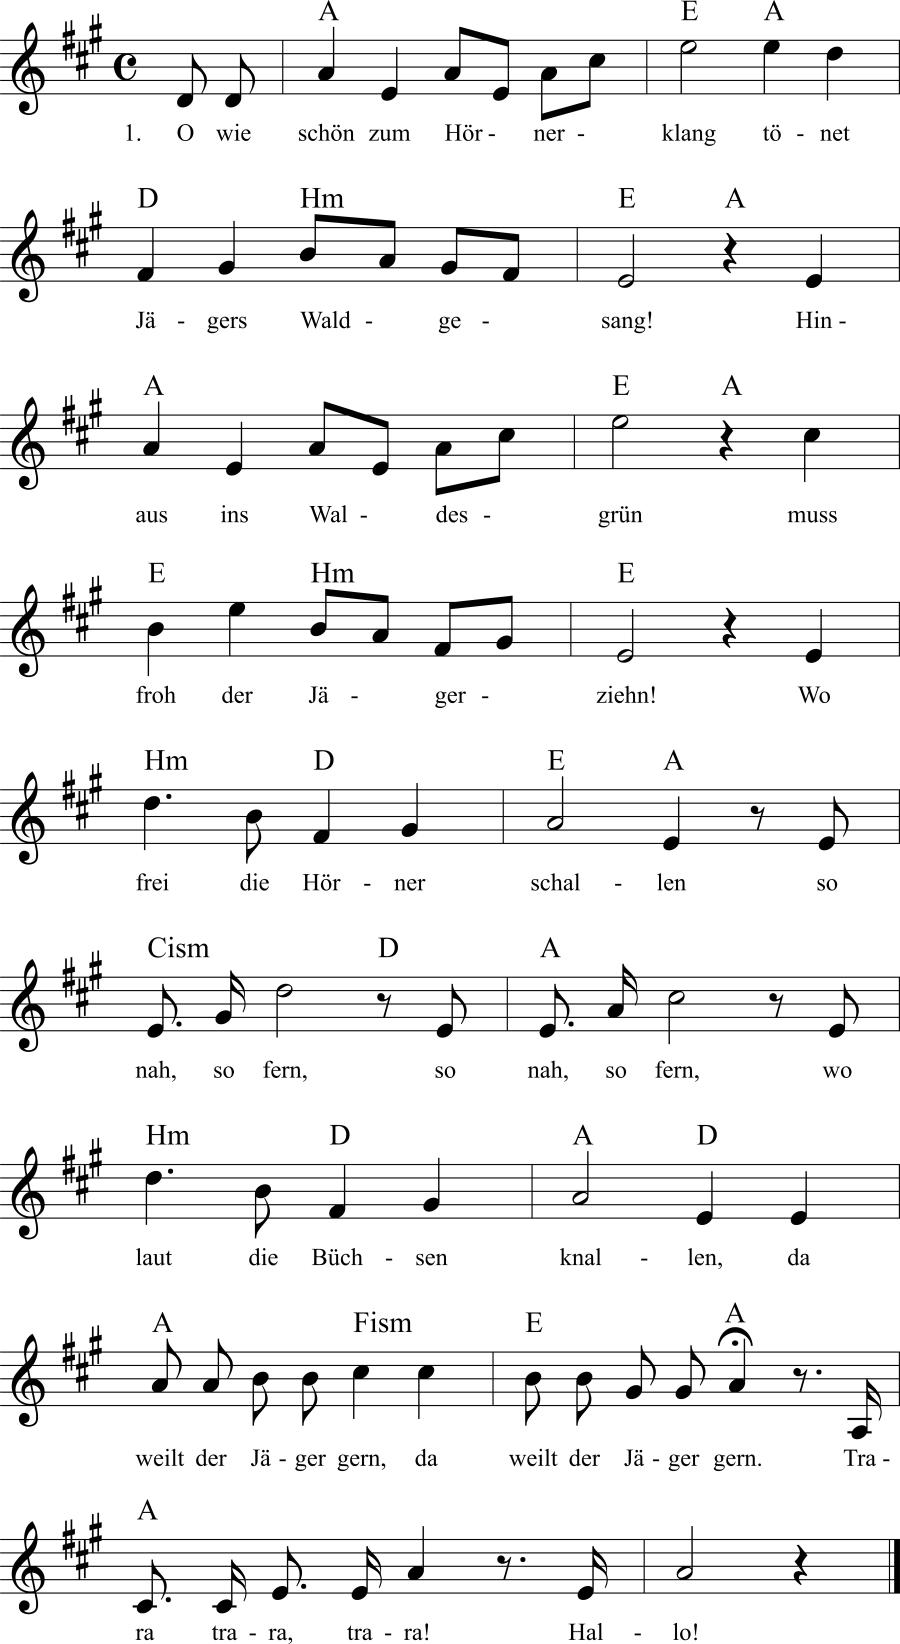 Musiknoten zum Lied Jägers Waldgesang